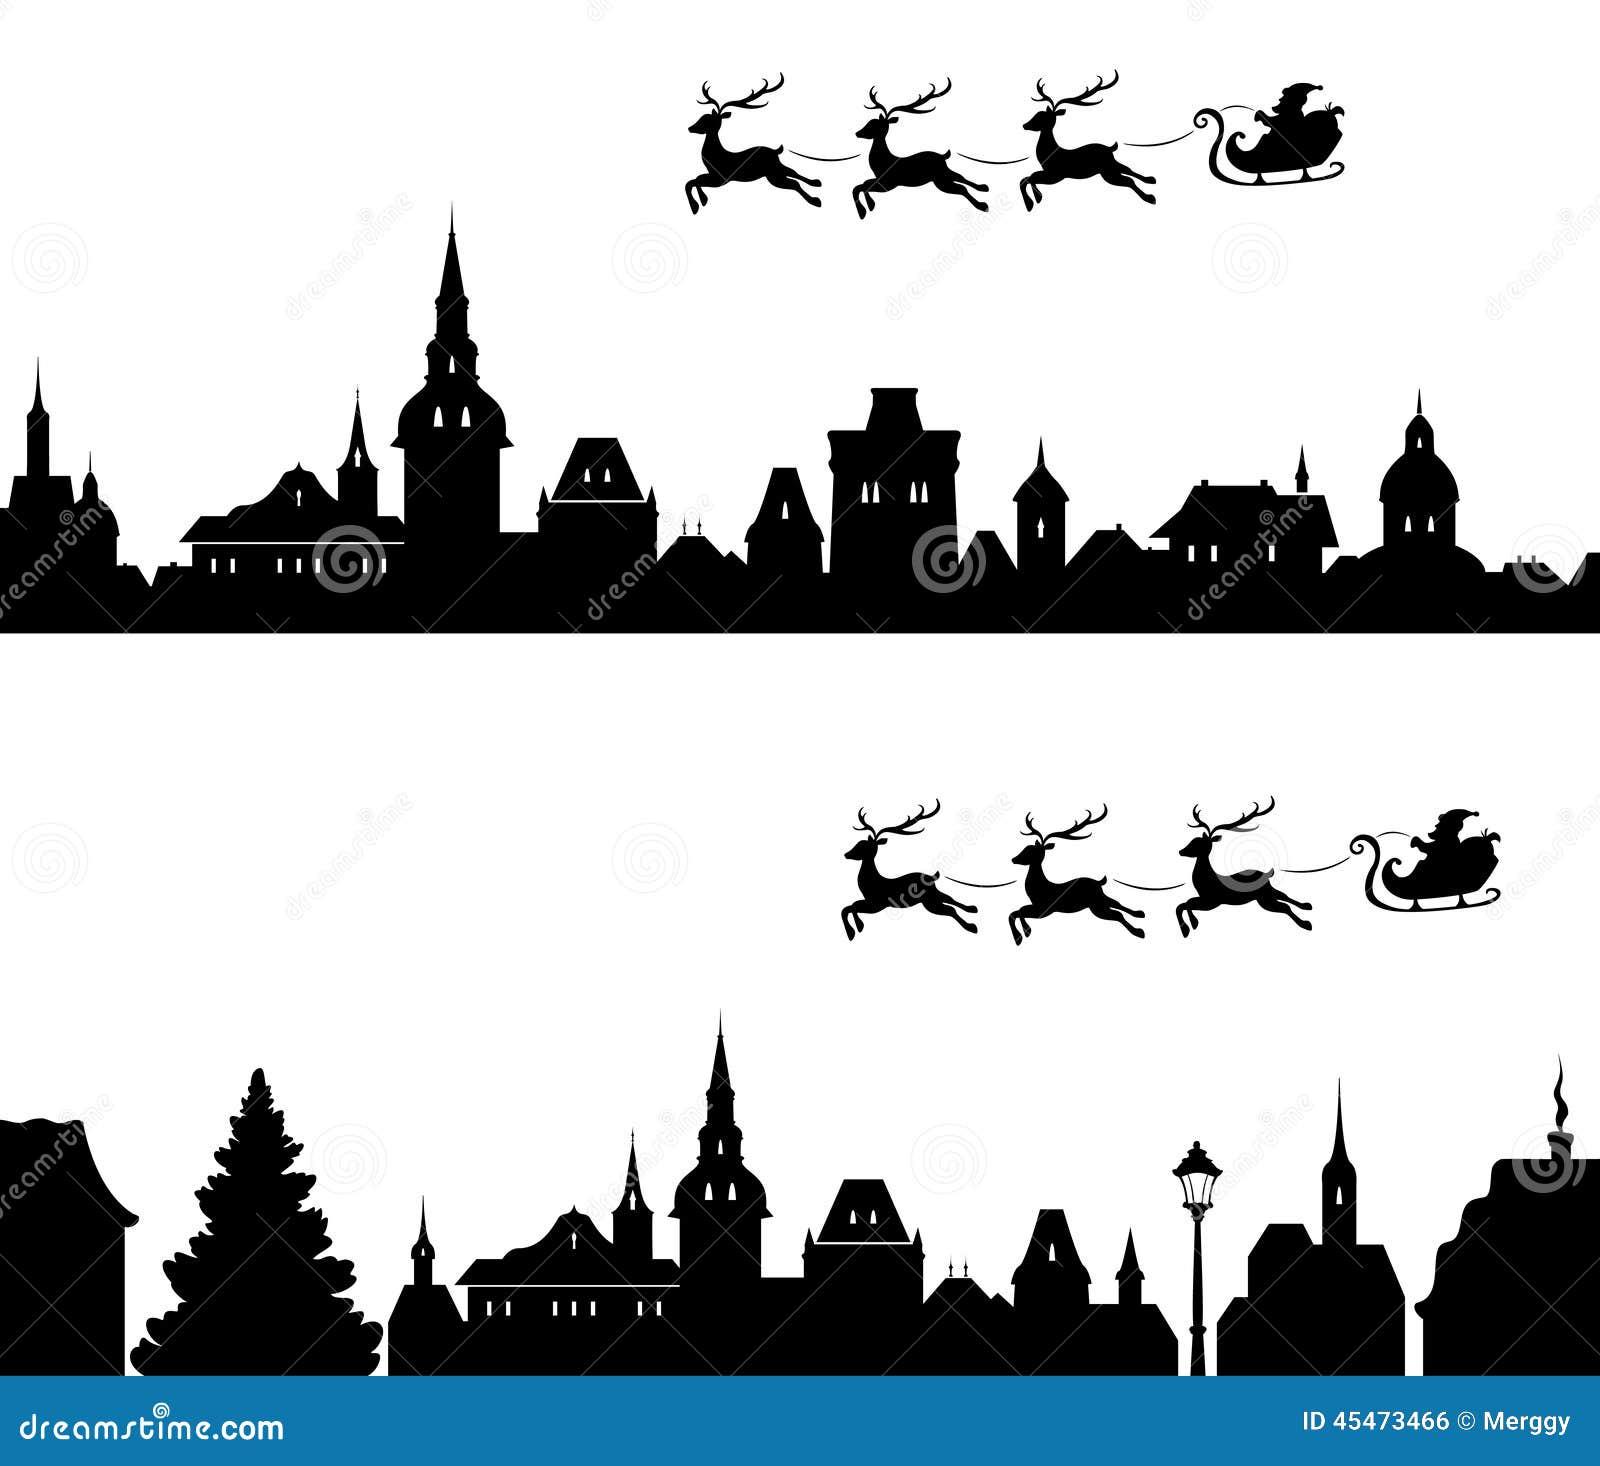 Santa Sleigh Silhouette Stock Vector - Image: 45473466